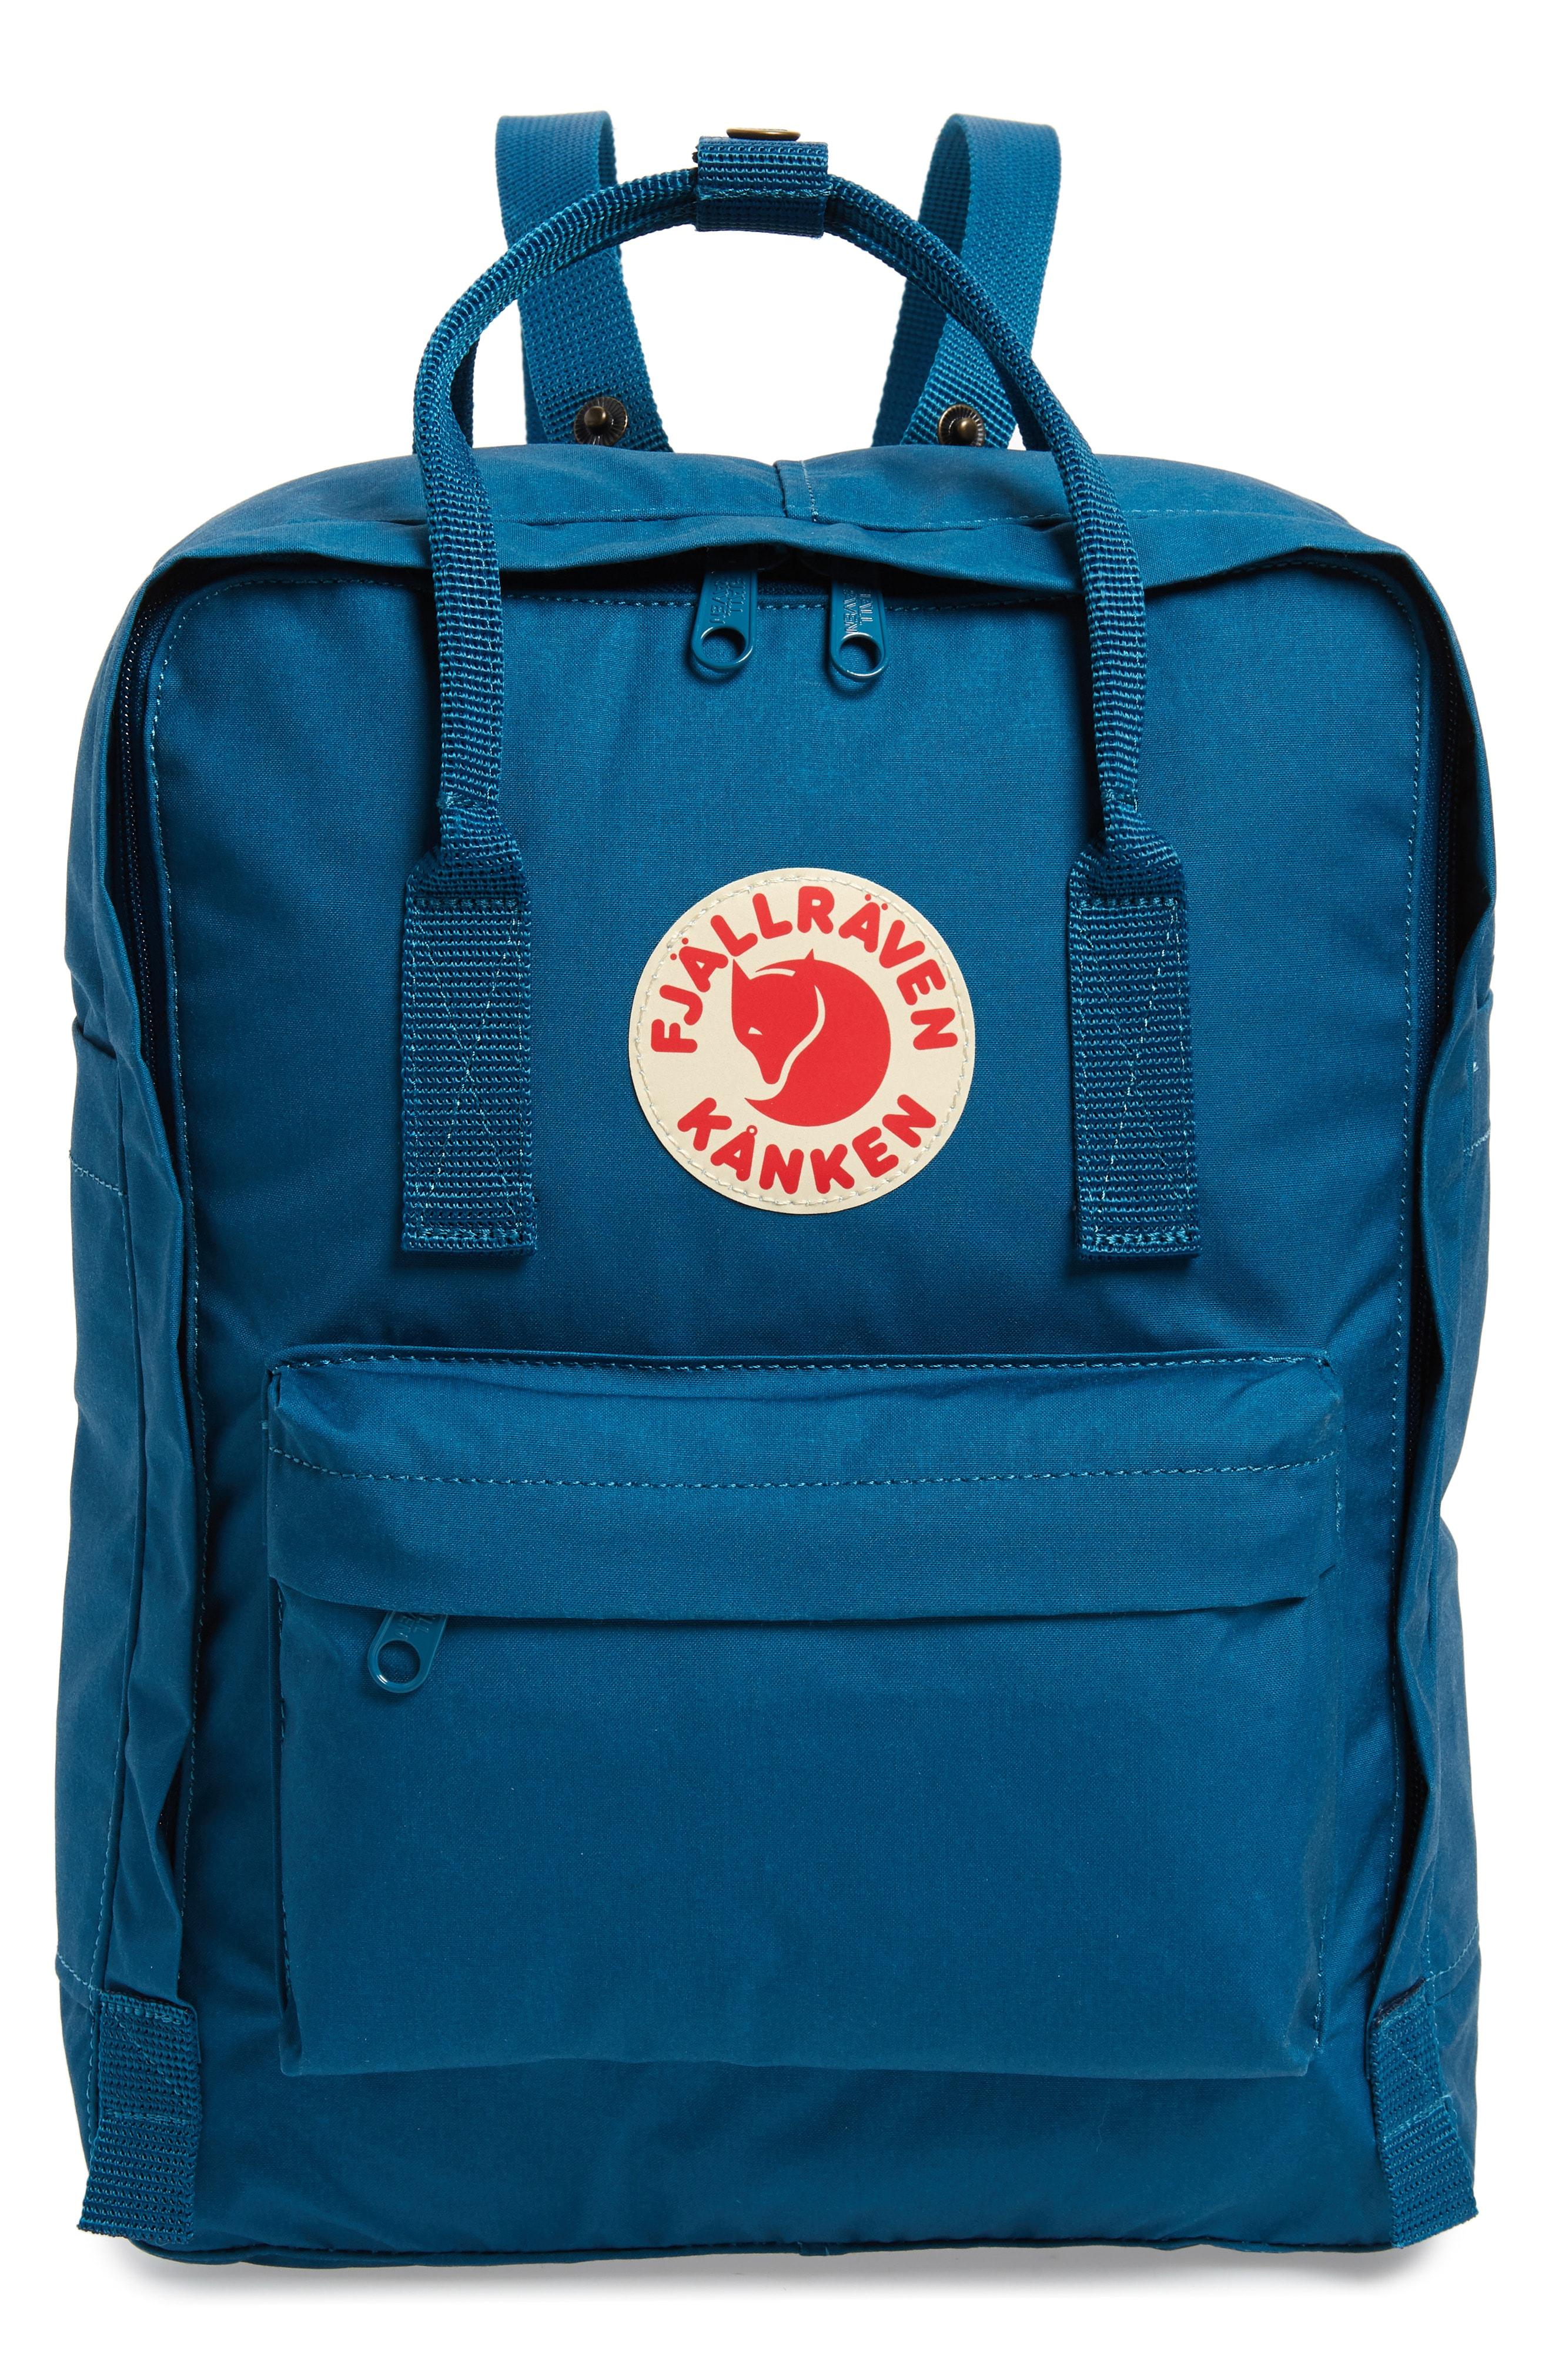 Fjllrven 'Knken' Water Resistant Backpack